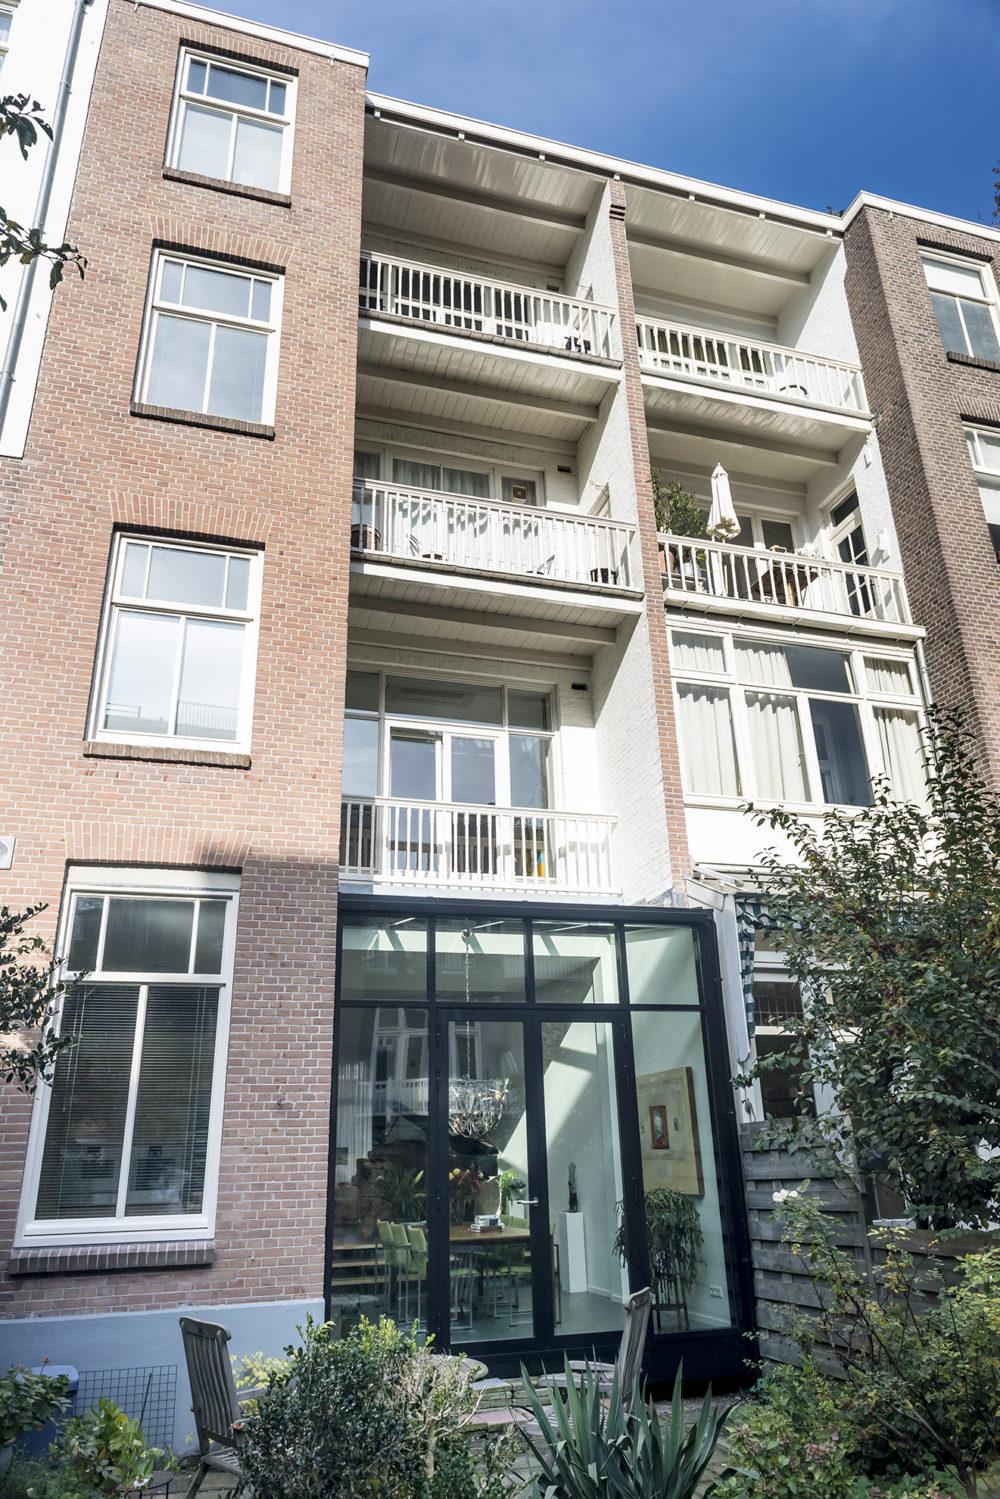 Verbouwing woonhuis amsterdam zuid gietermans van dijk for Woonhuis rotterdam